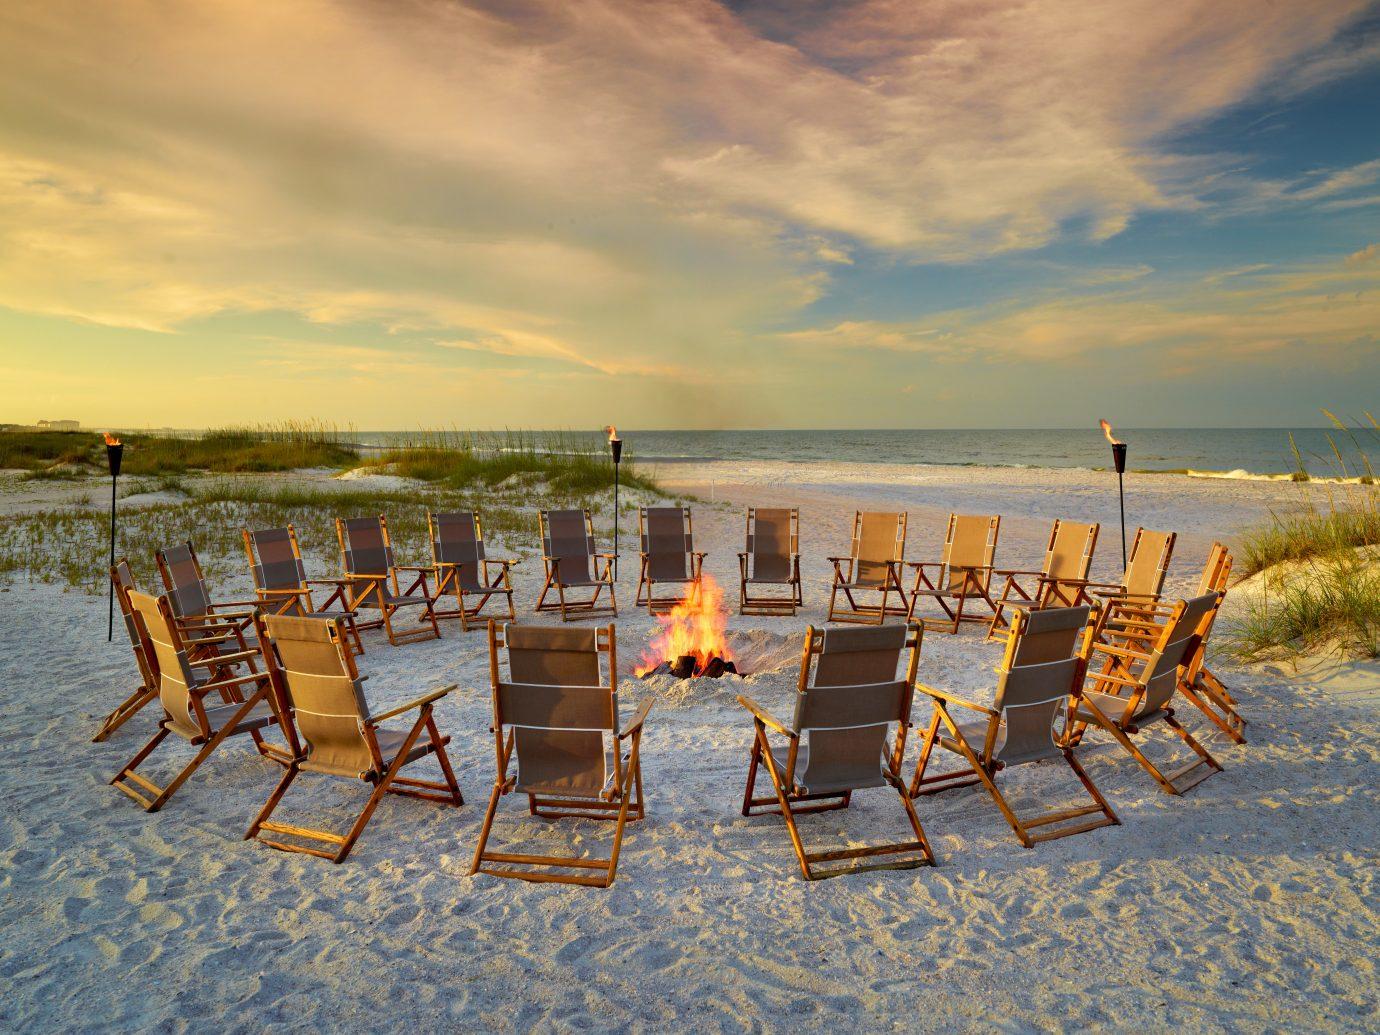 Beach Beachfront Firepit Ocean Trip Ideas sky outdoor chair water shore Sea Nature vacation morning evening Sunset set line